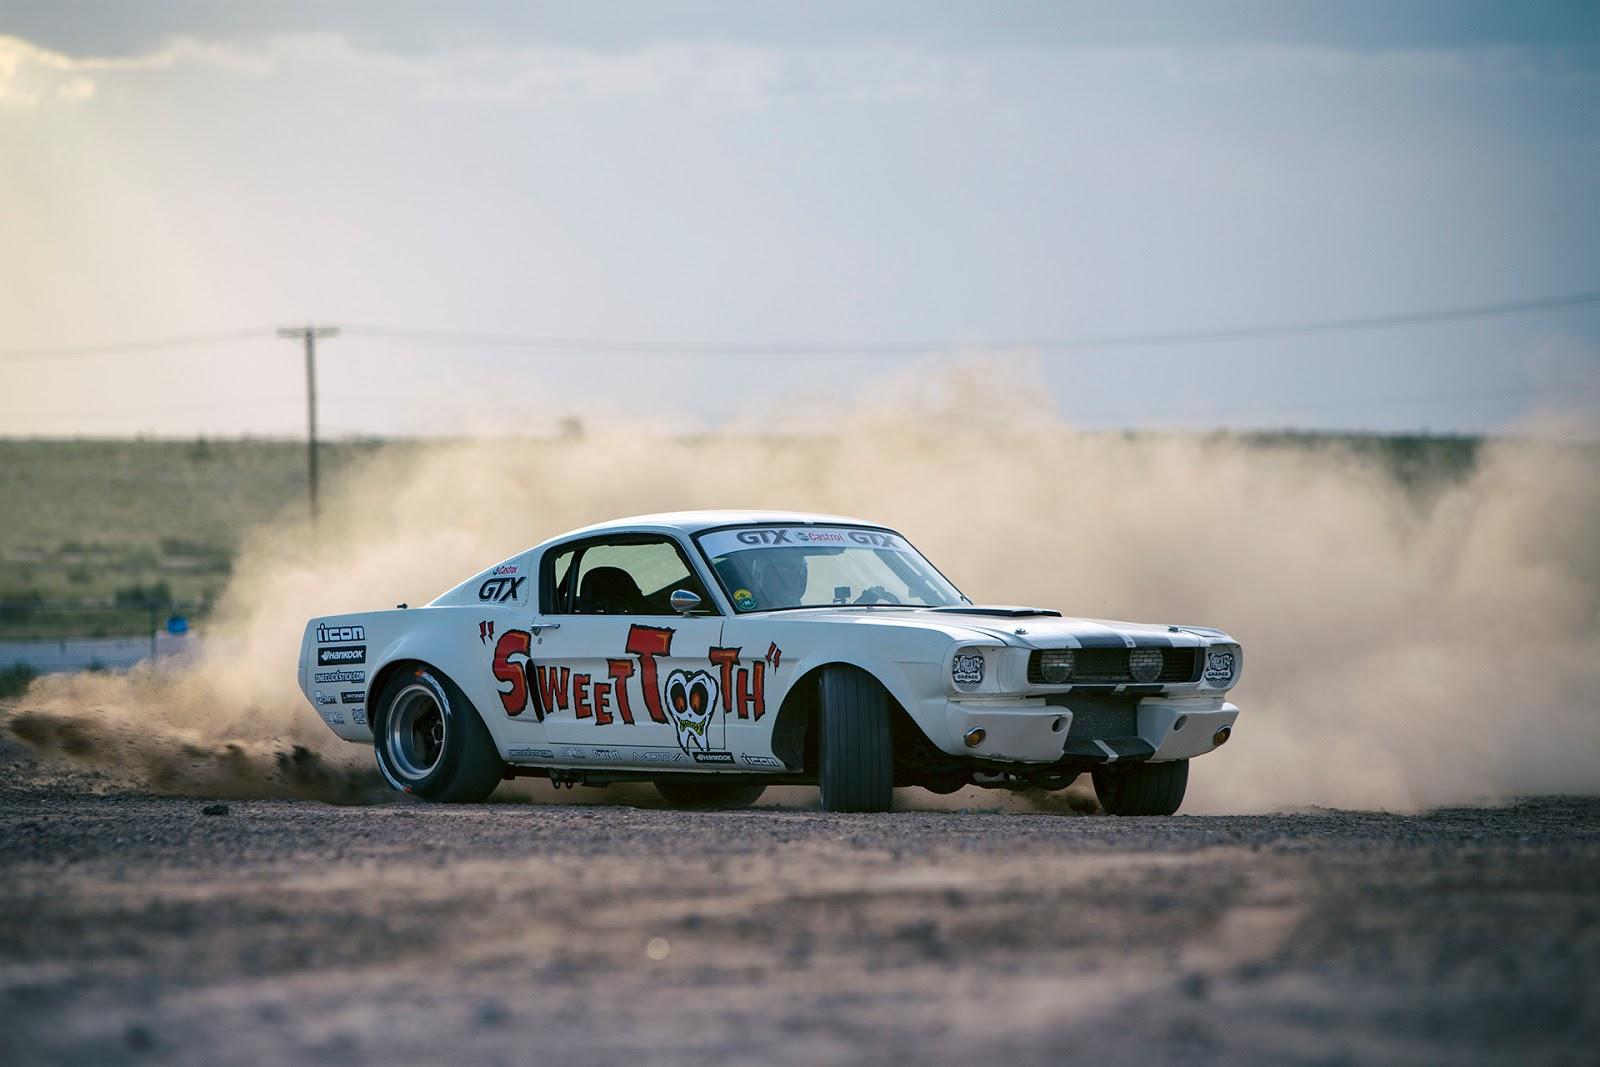 Dan Brockett Drift 4k Or Motorcycle Vs Car Drift Battle